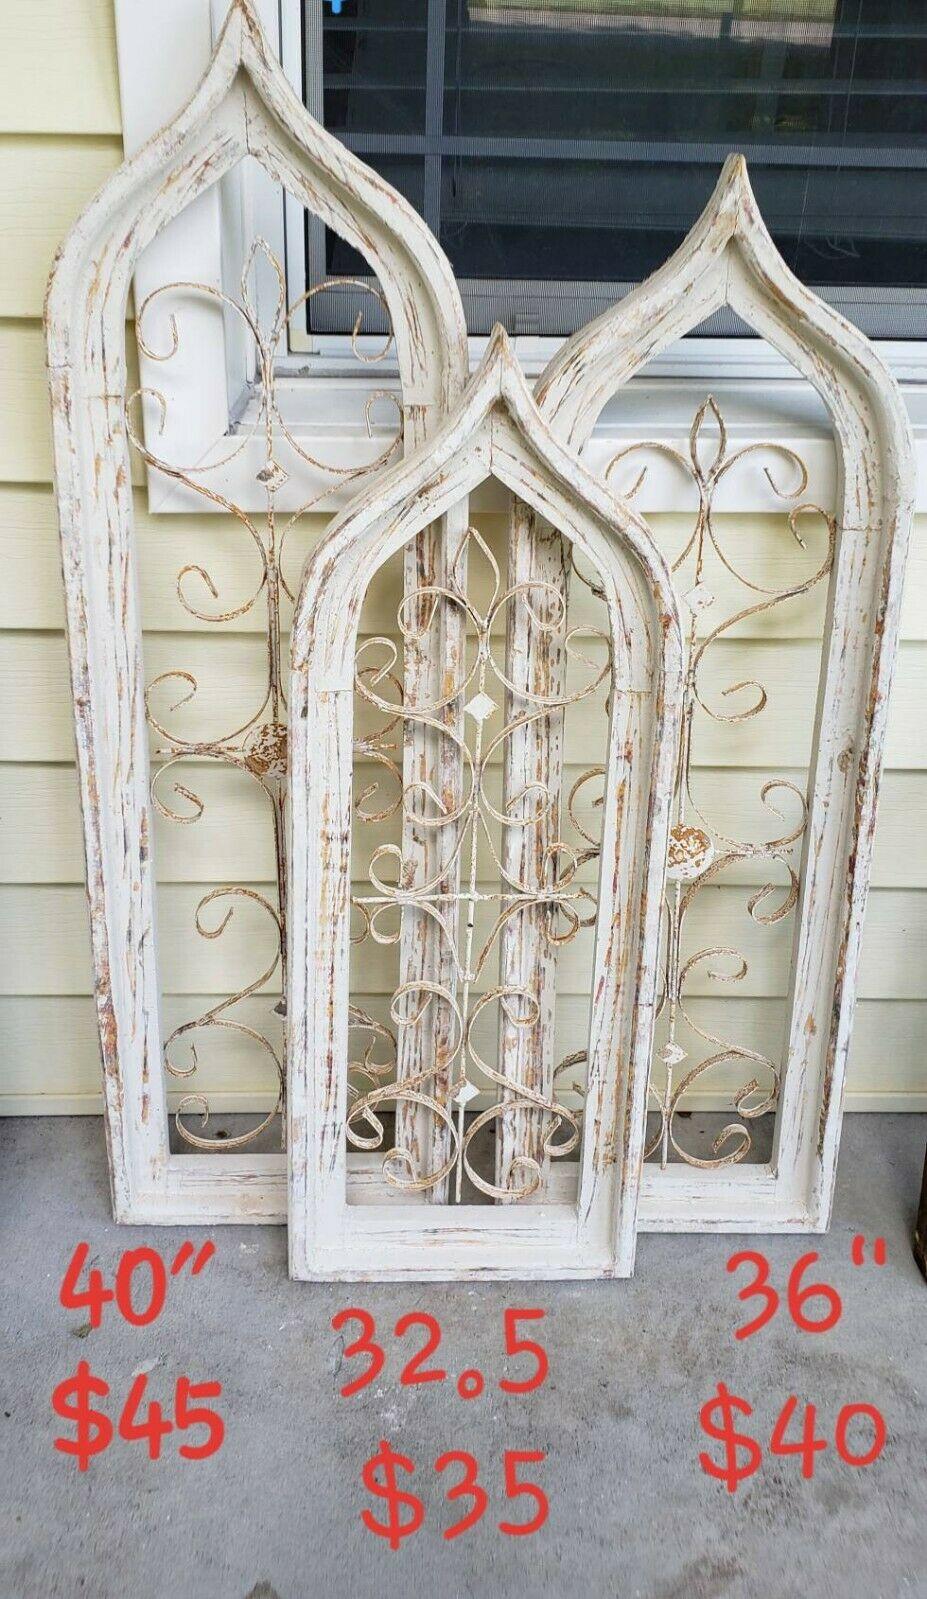 Set 3 Cream Gothic Wood Metal Window Frames Arch Farmhouse Wall Church  Window Regarding Window Cream Wood Wall Mirrors (Image 16 of 20)